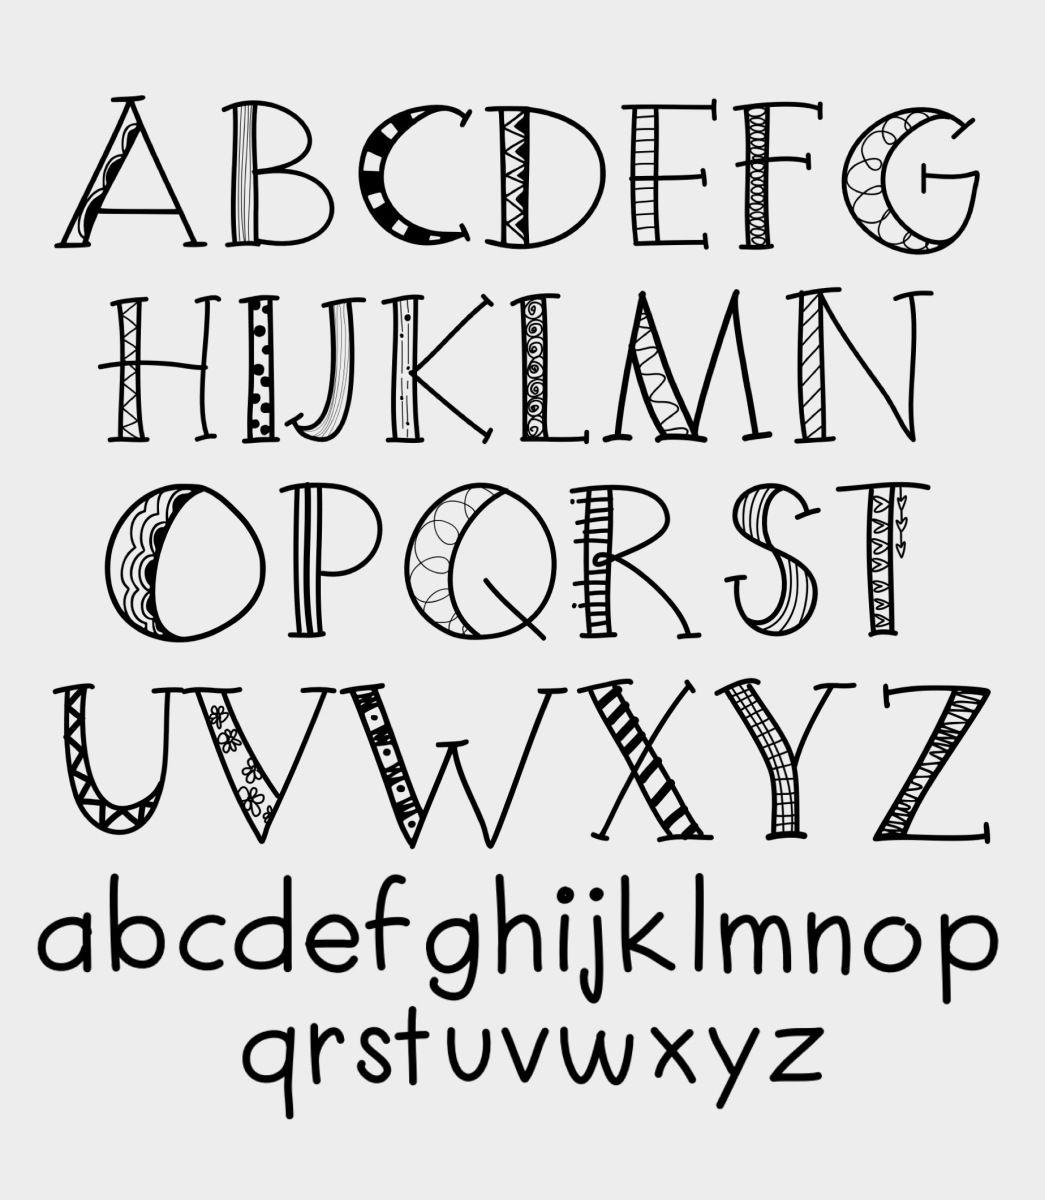 Free Downloadable Font Hand lettering alphabet, Doodle